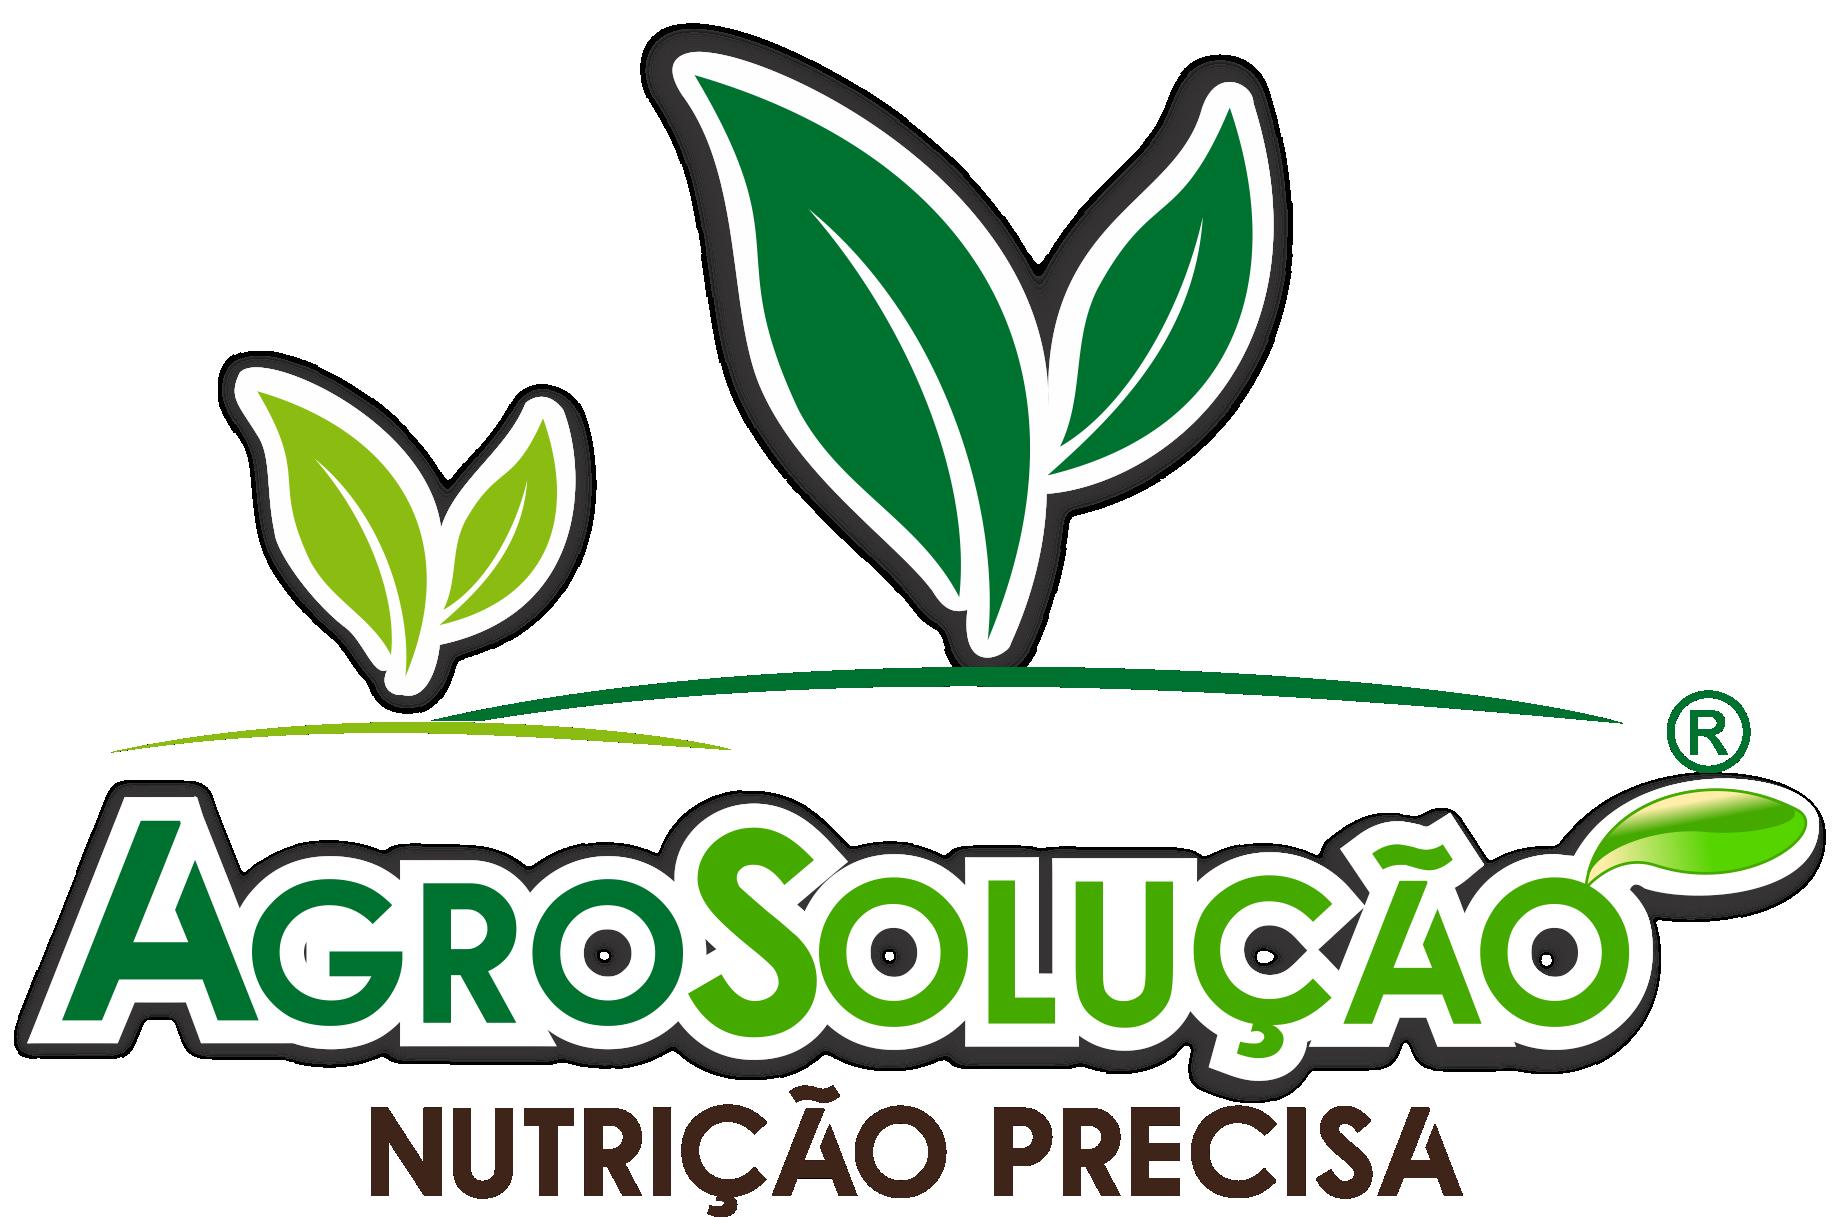 agrosolucao_logo_slogan